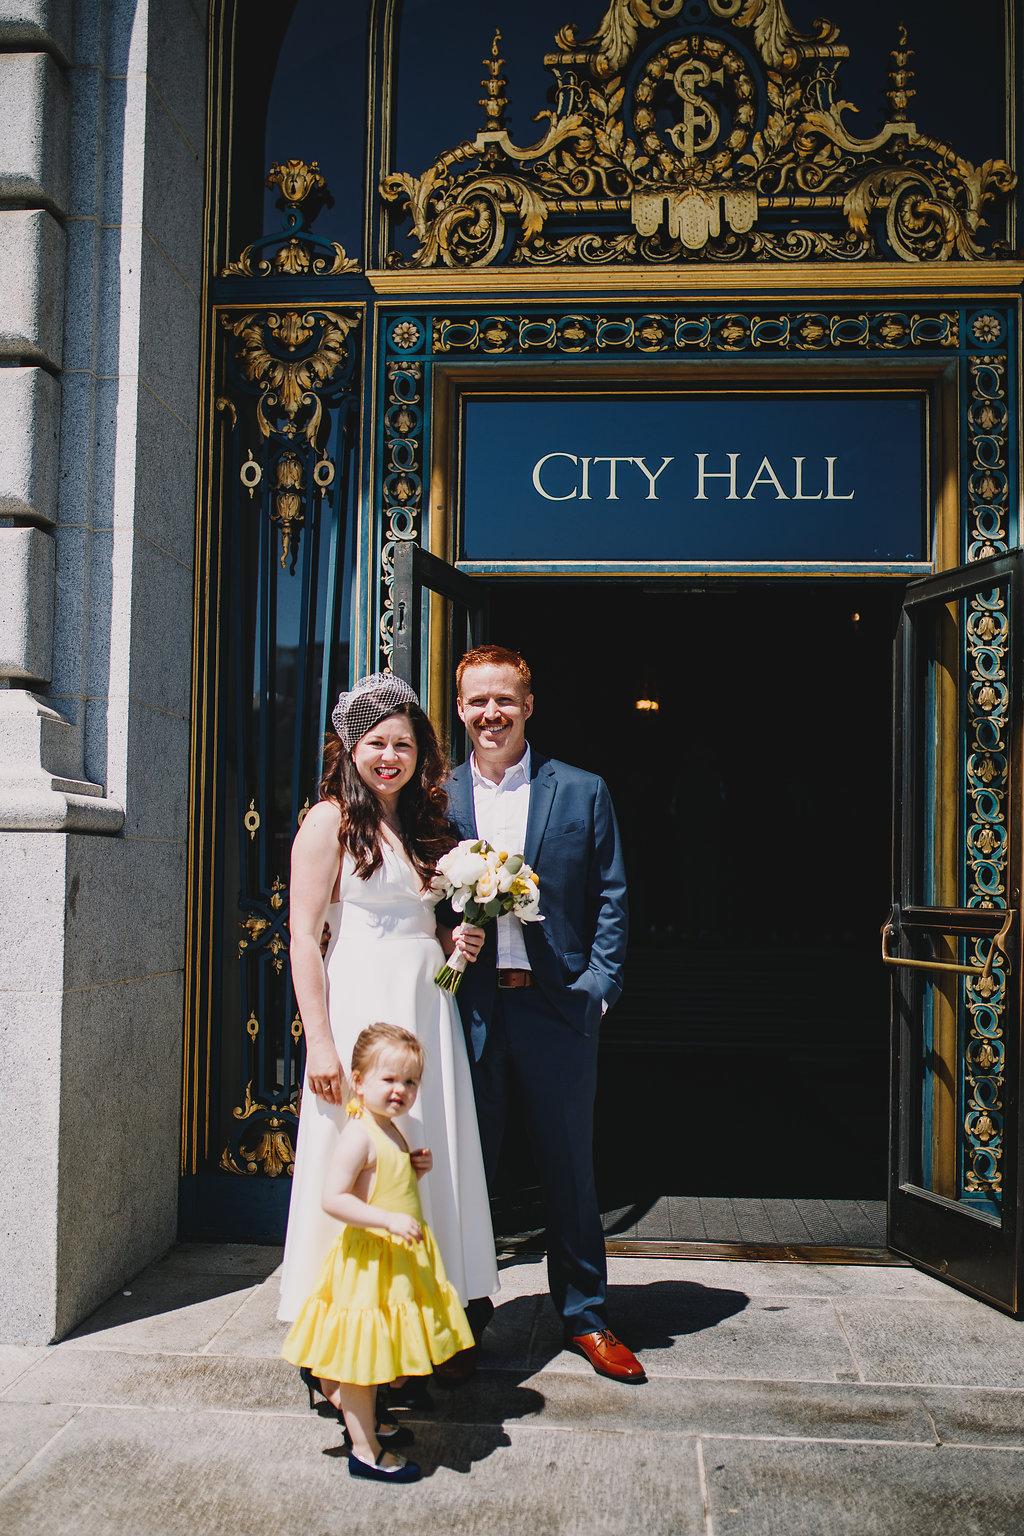 A San Francisco City Hall Wedding - The Overwhelmed Bride Wedding Ideas Inspiration Blog